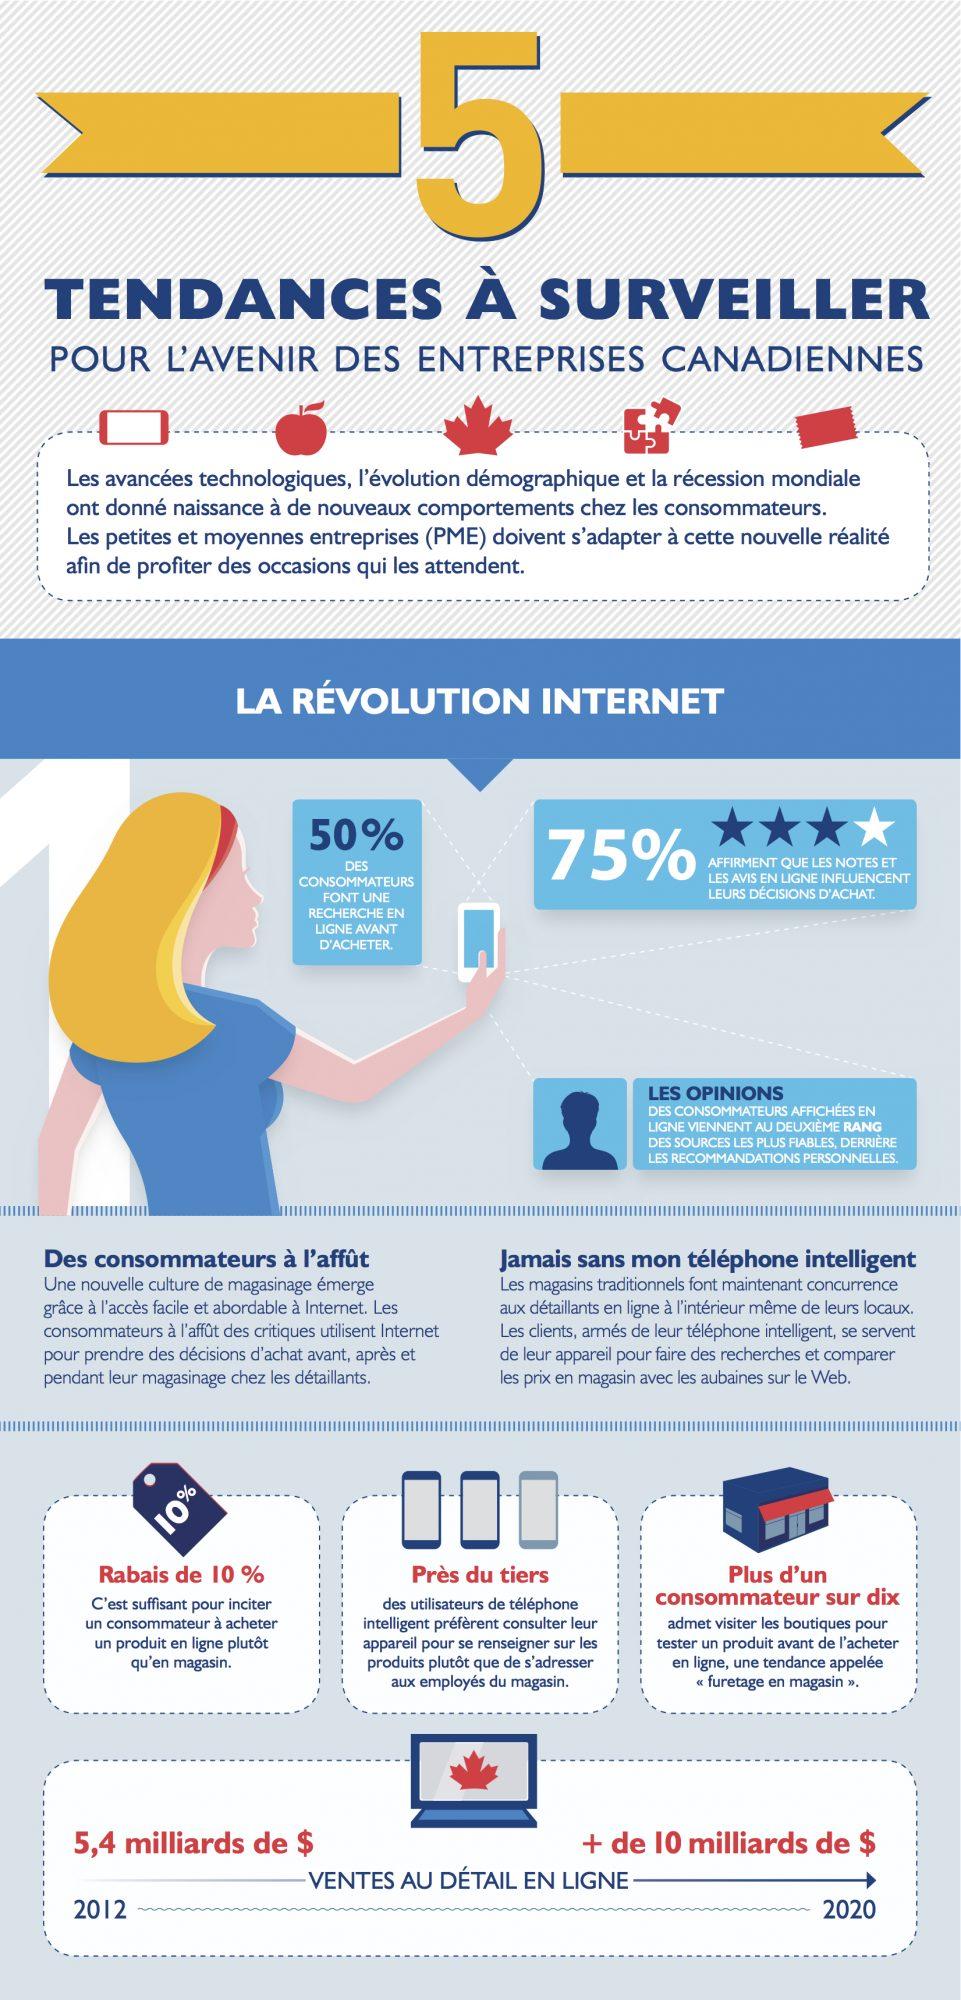 La révolution Internet, BDC